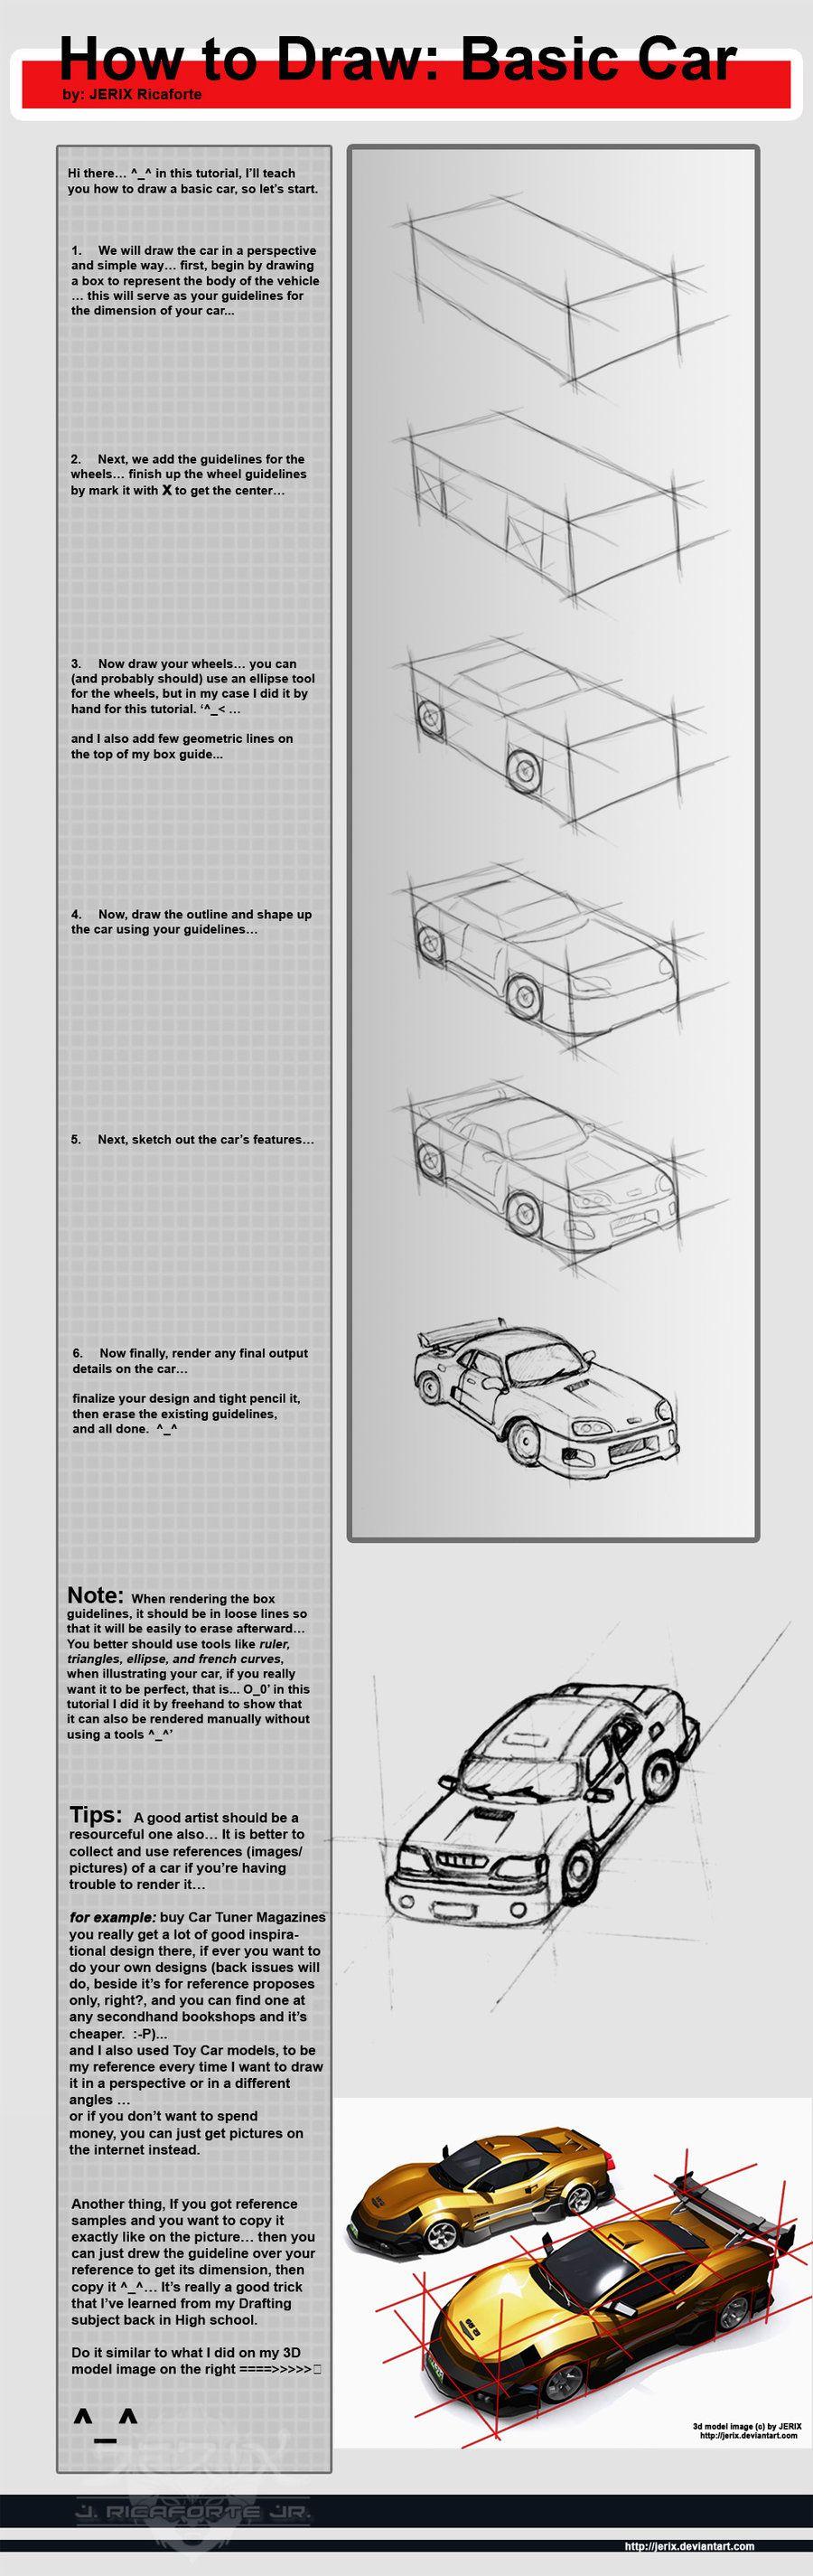 How To Draw Basic Car O_o By Jerixiantart On @deviantart